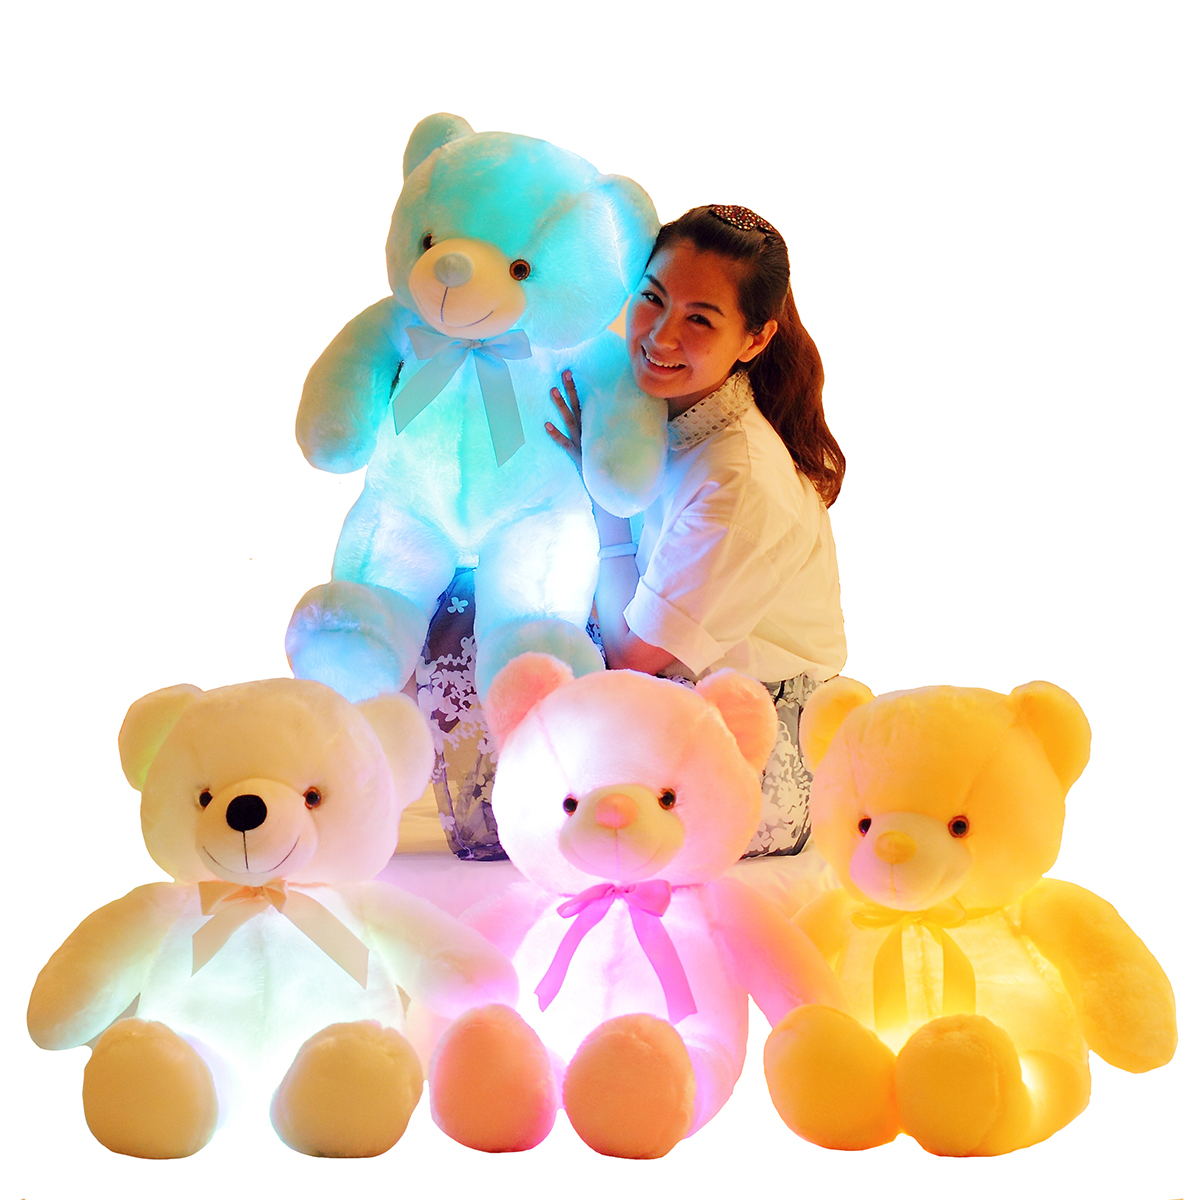 Luminous 25/30/50cm Creative Light Up LED Colorful Glowing Teddy Bear Stuffed Animal Plush Toy Christmas Gift For Kid